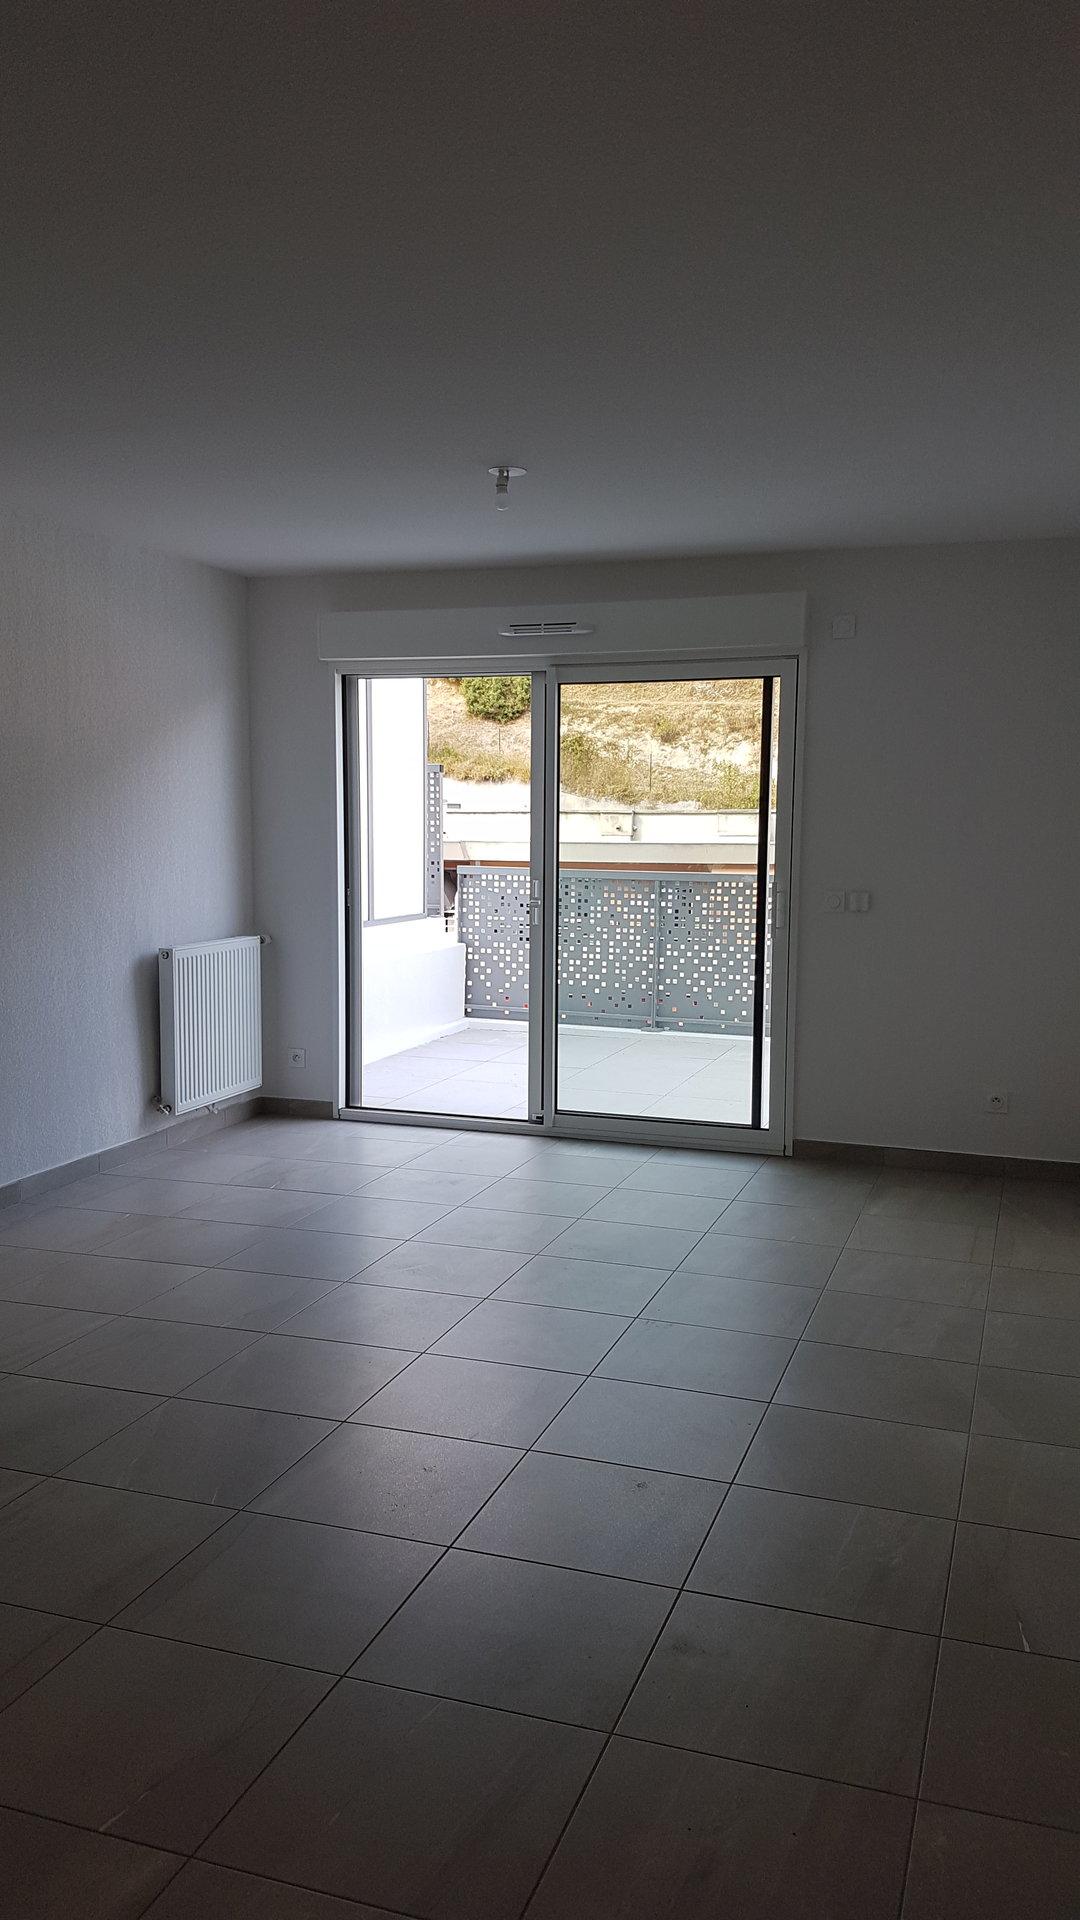 VENTE STUDIO NICE - 140 000€